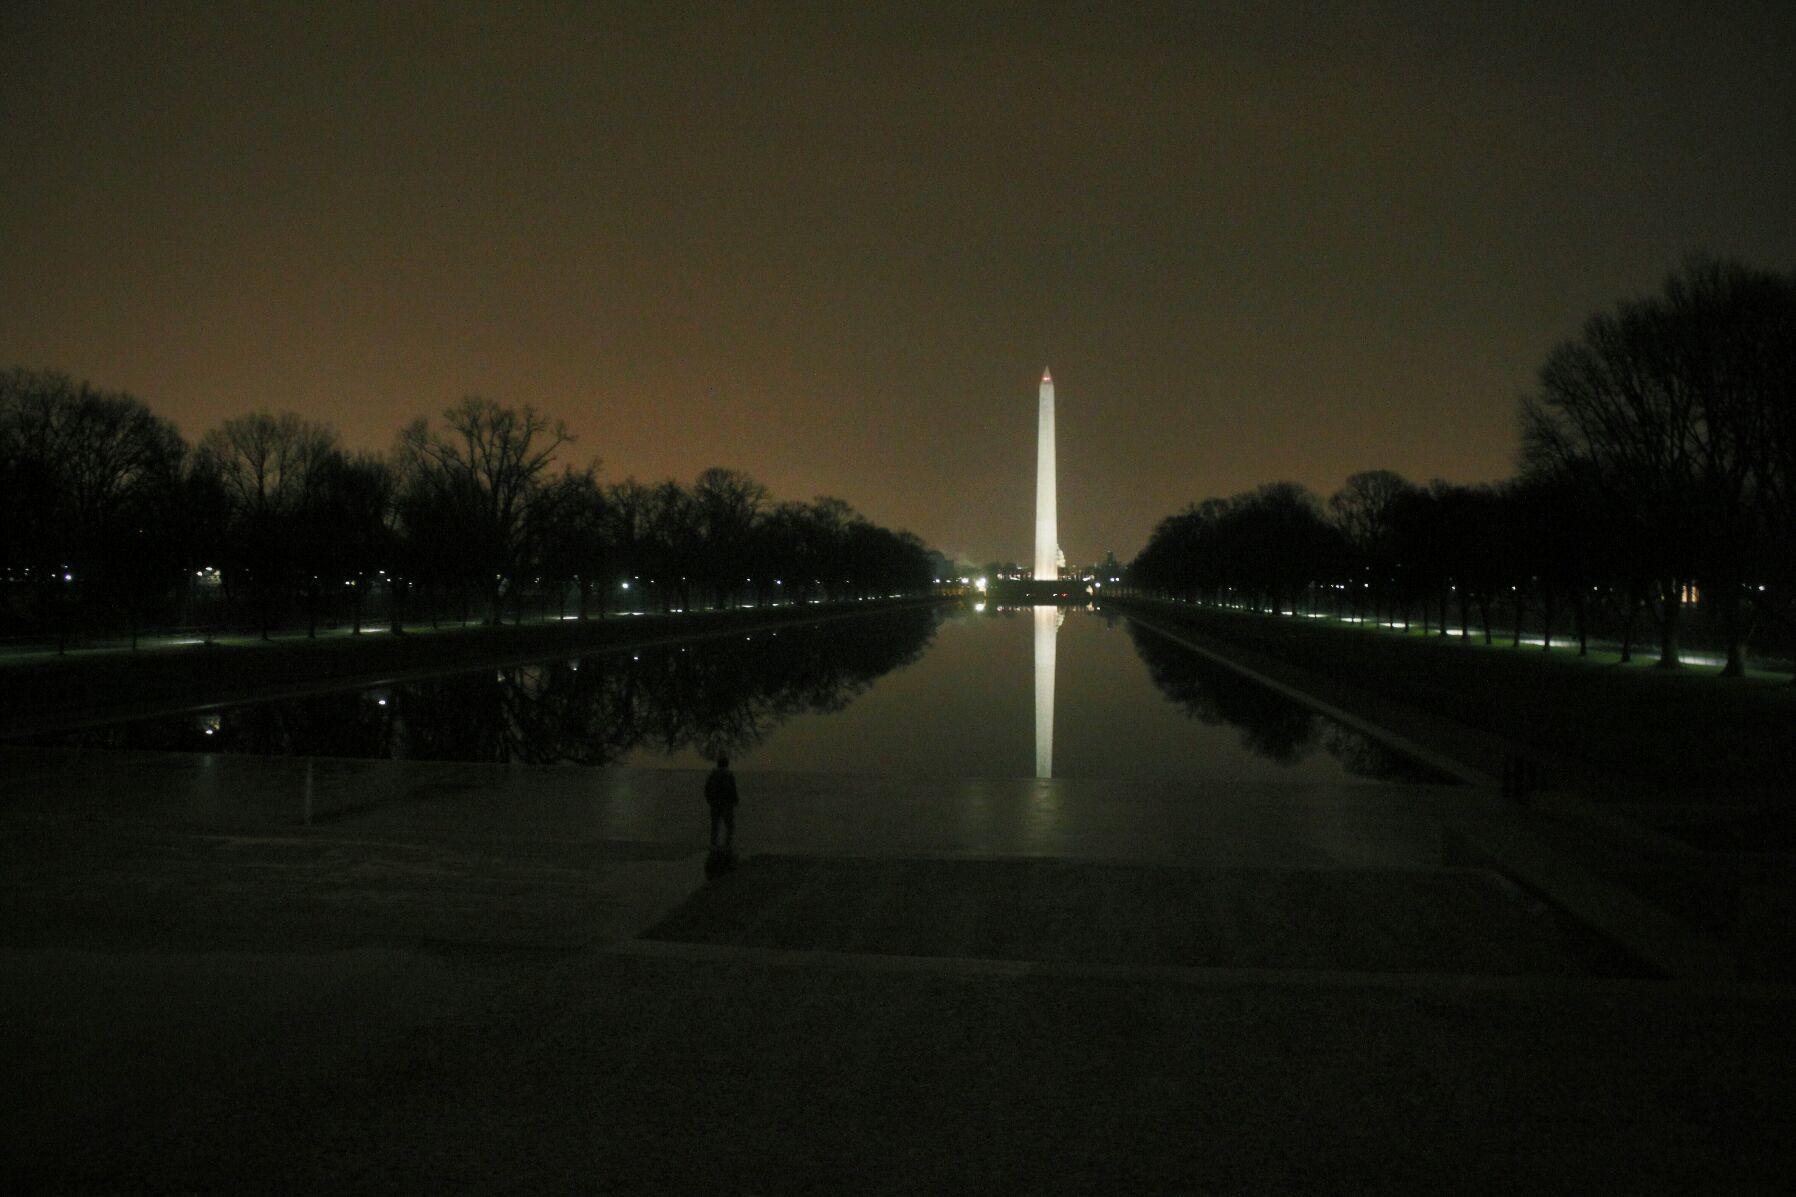 Washington Monument in D.C.